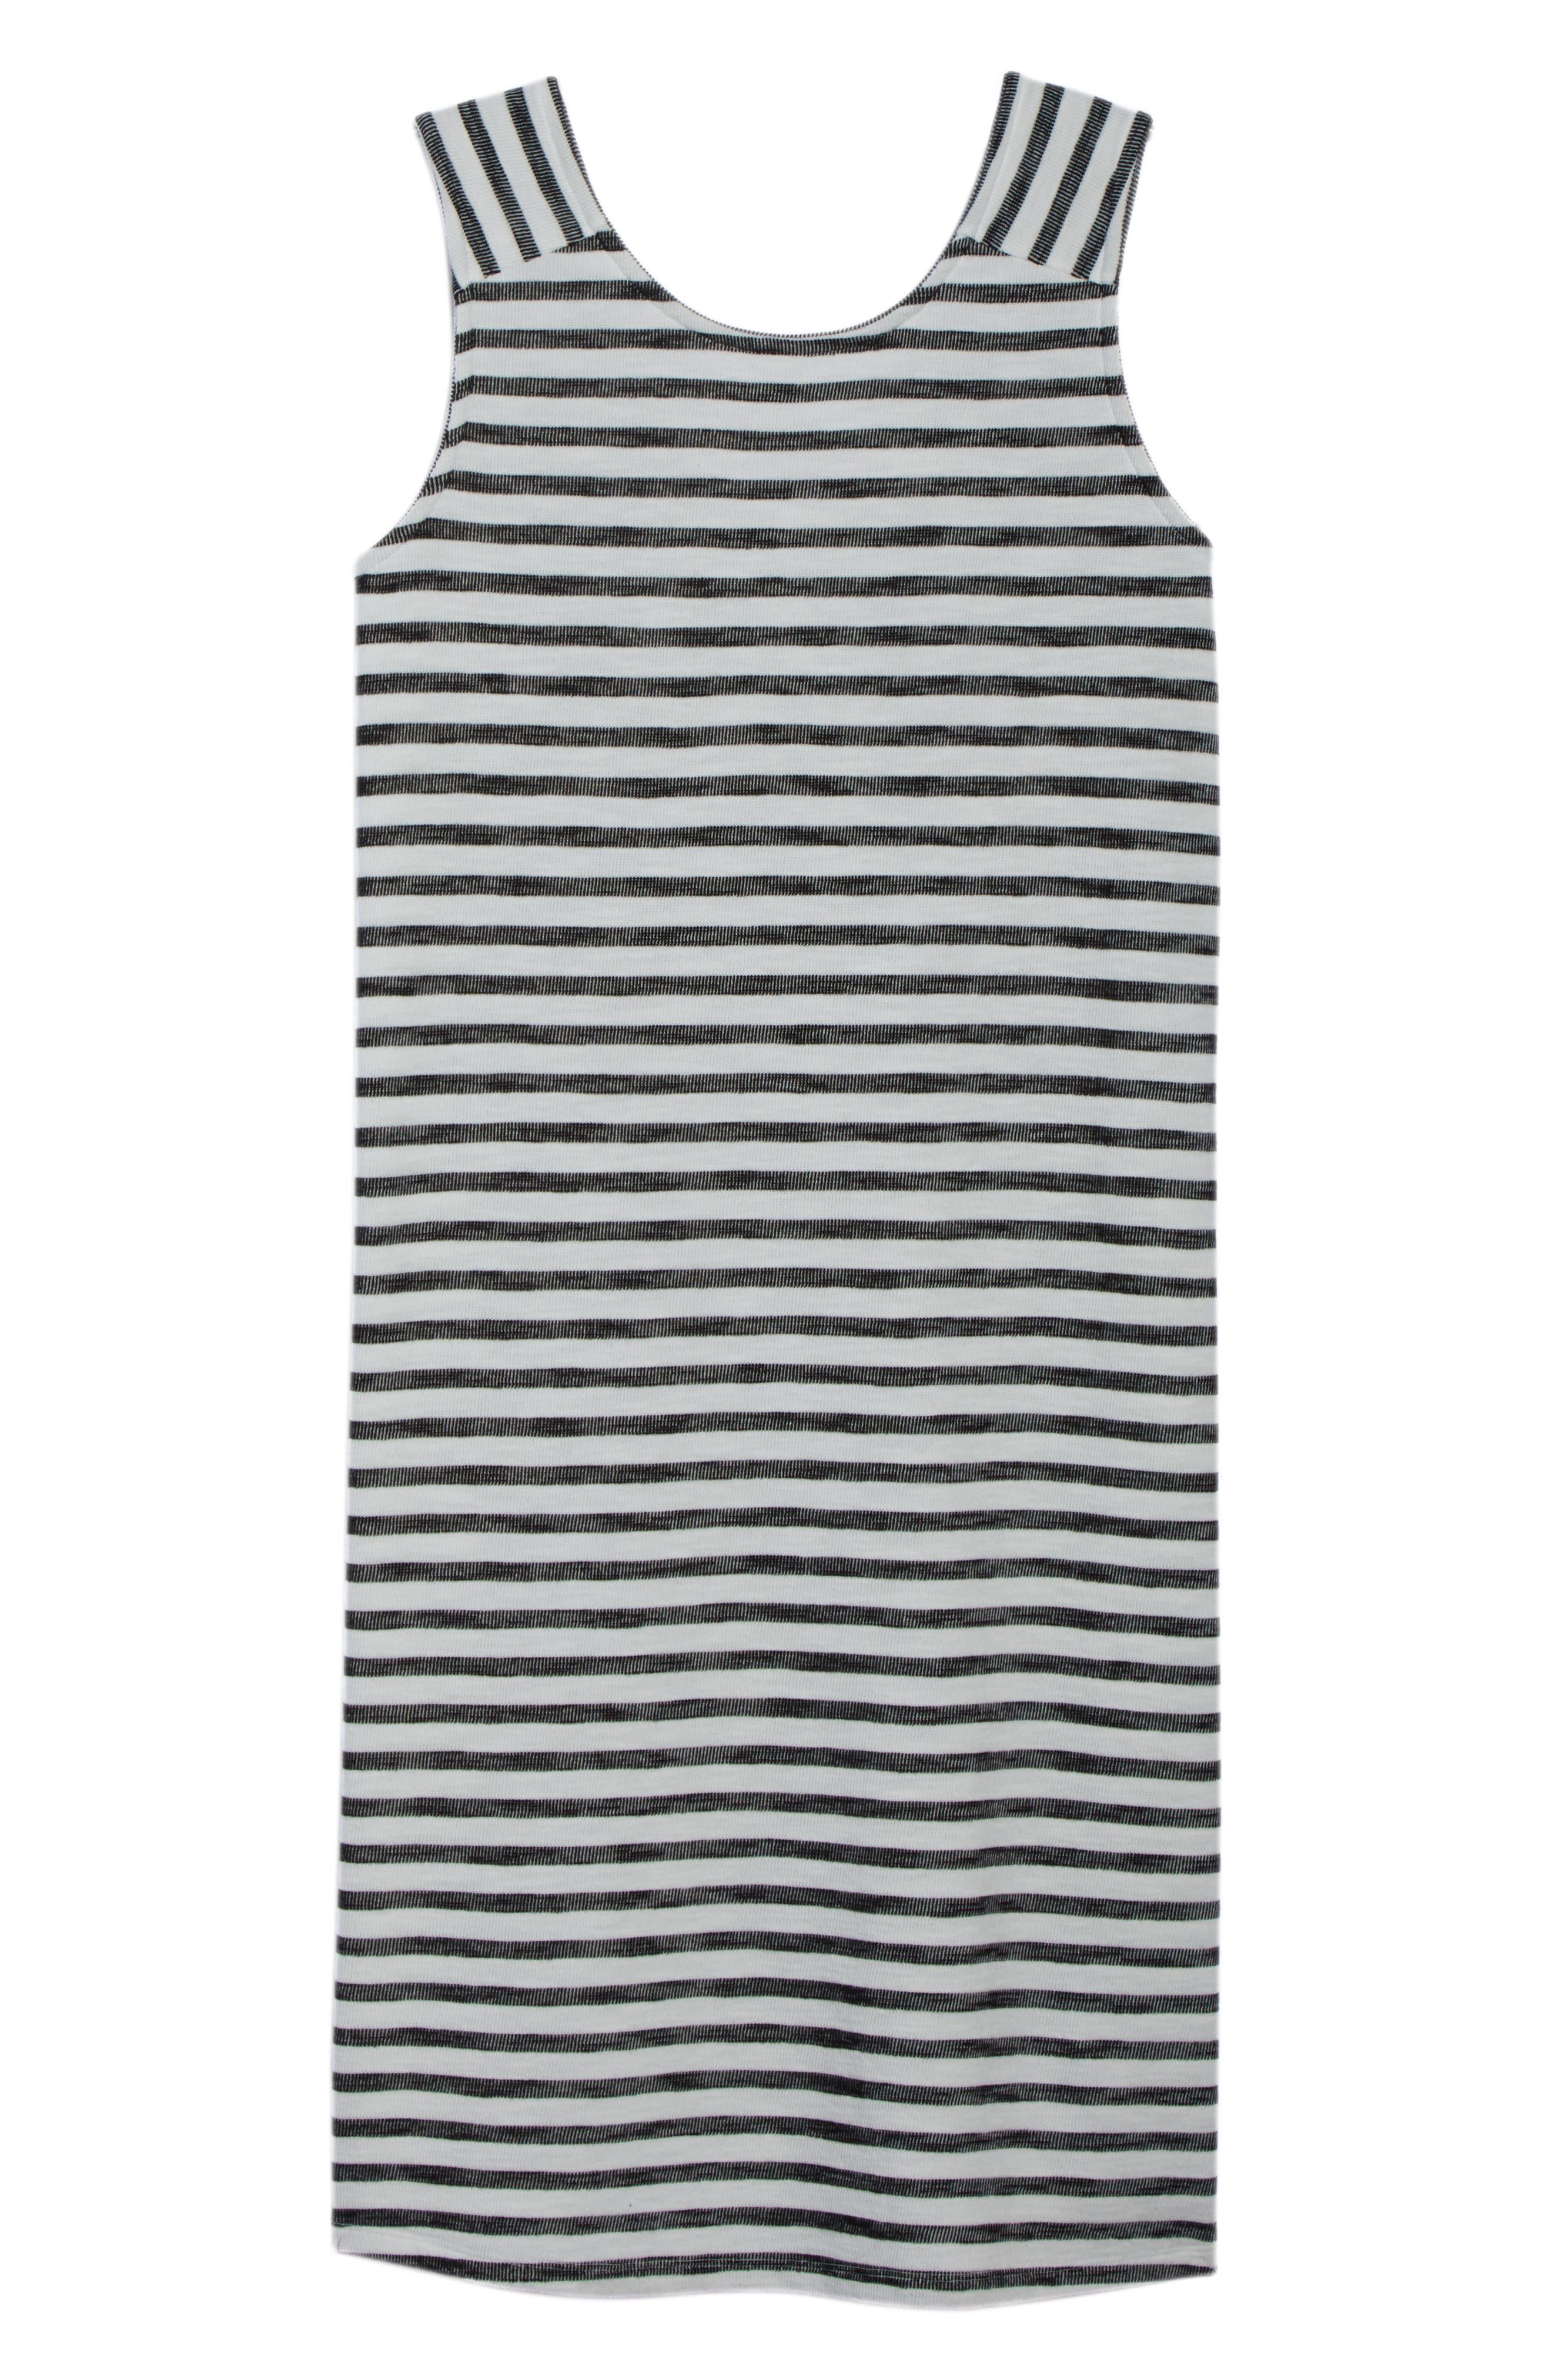 Button Back Knit Dress,                             Alternate thumbnail 7, color,                             901